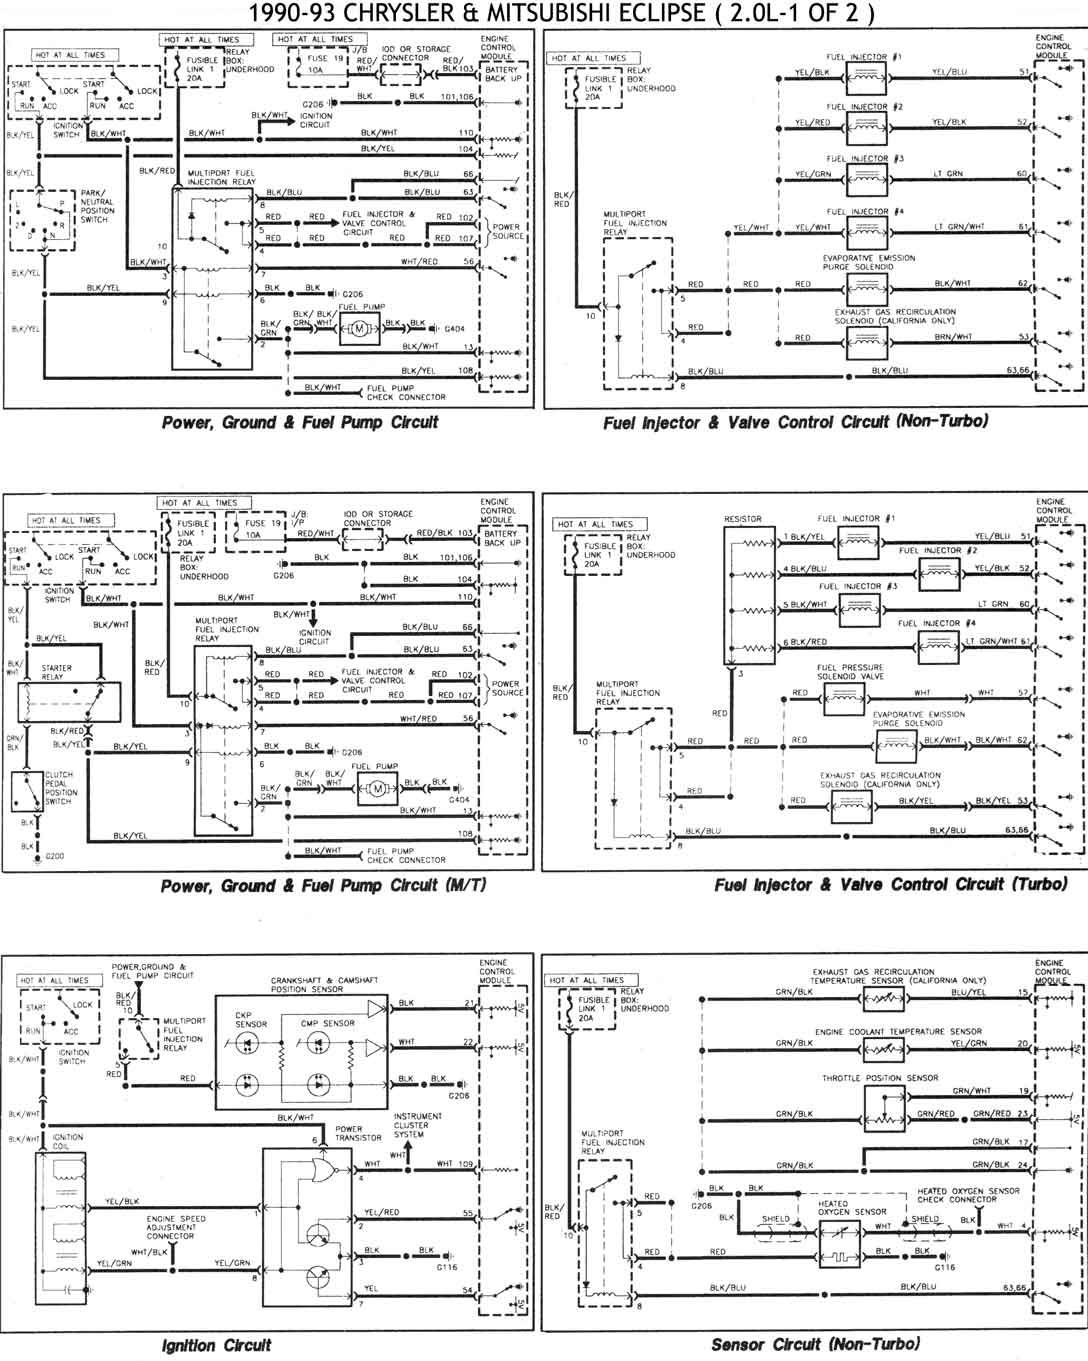 Defroster Nozzle Duct 1871906 moreover 6924 Meseta Inferior Derecha Copiloto moreover Radiator Cooling likewise 95 Honda Odyssey Engine Diagram additionally AC  PRESSOR ASSY MB899714 MR148623 MITSUBISHI EXPO LRV 05 1991 05 1995. on 1993 mitsubishi expo